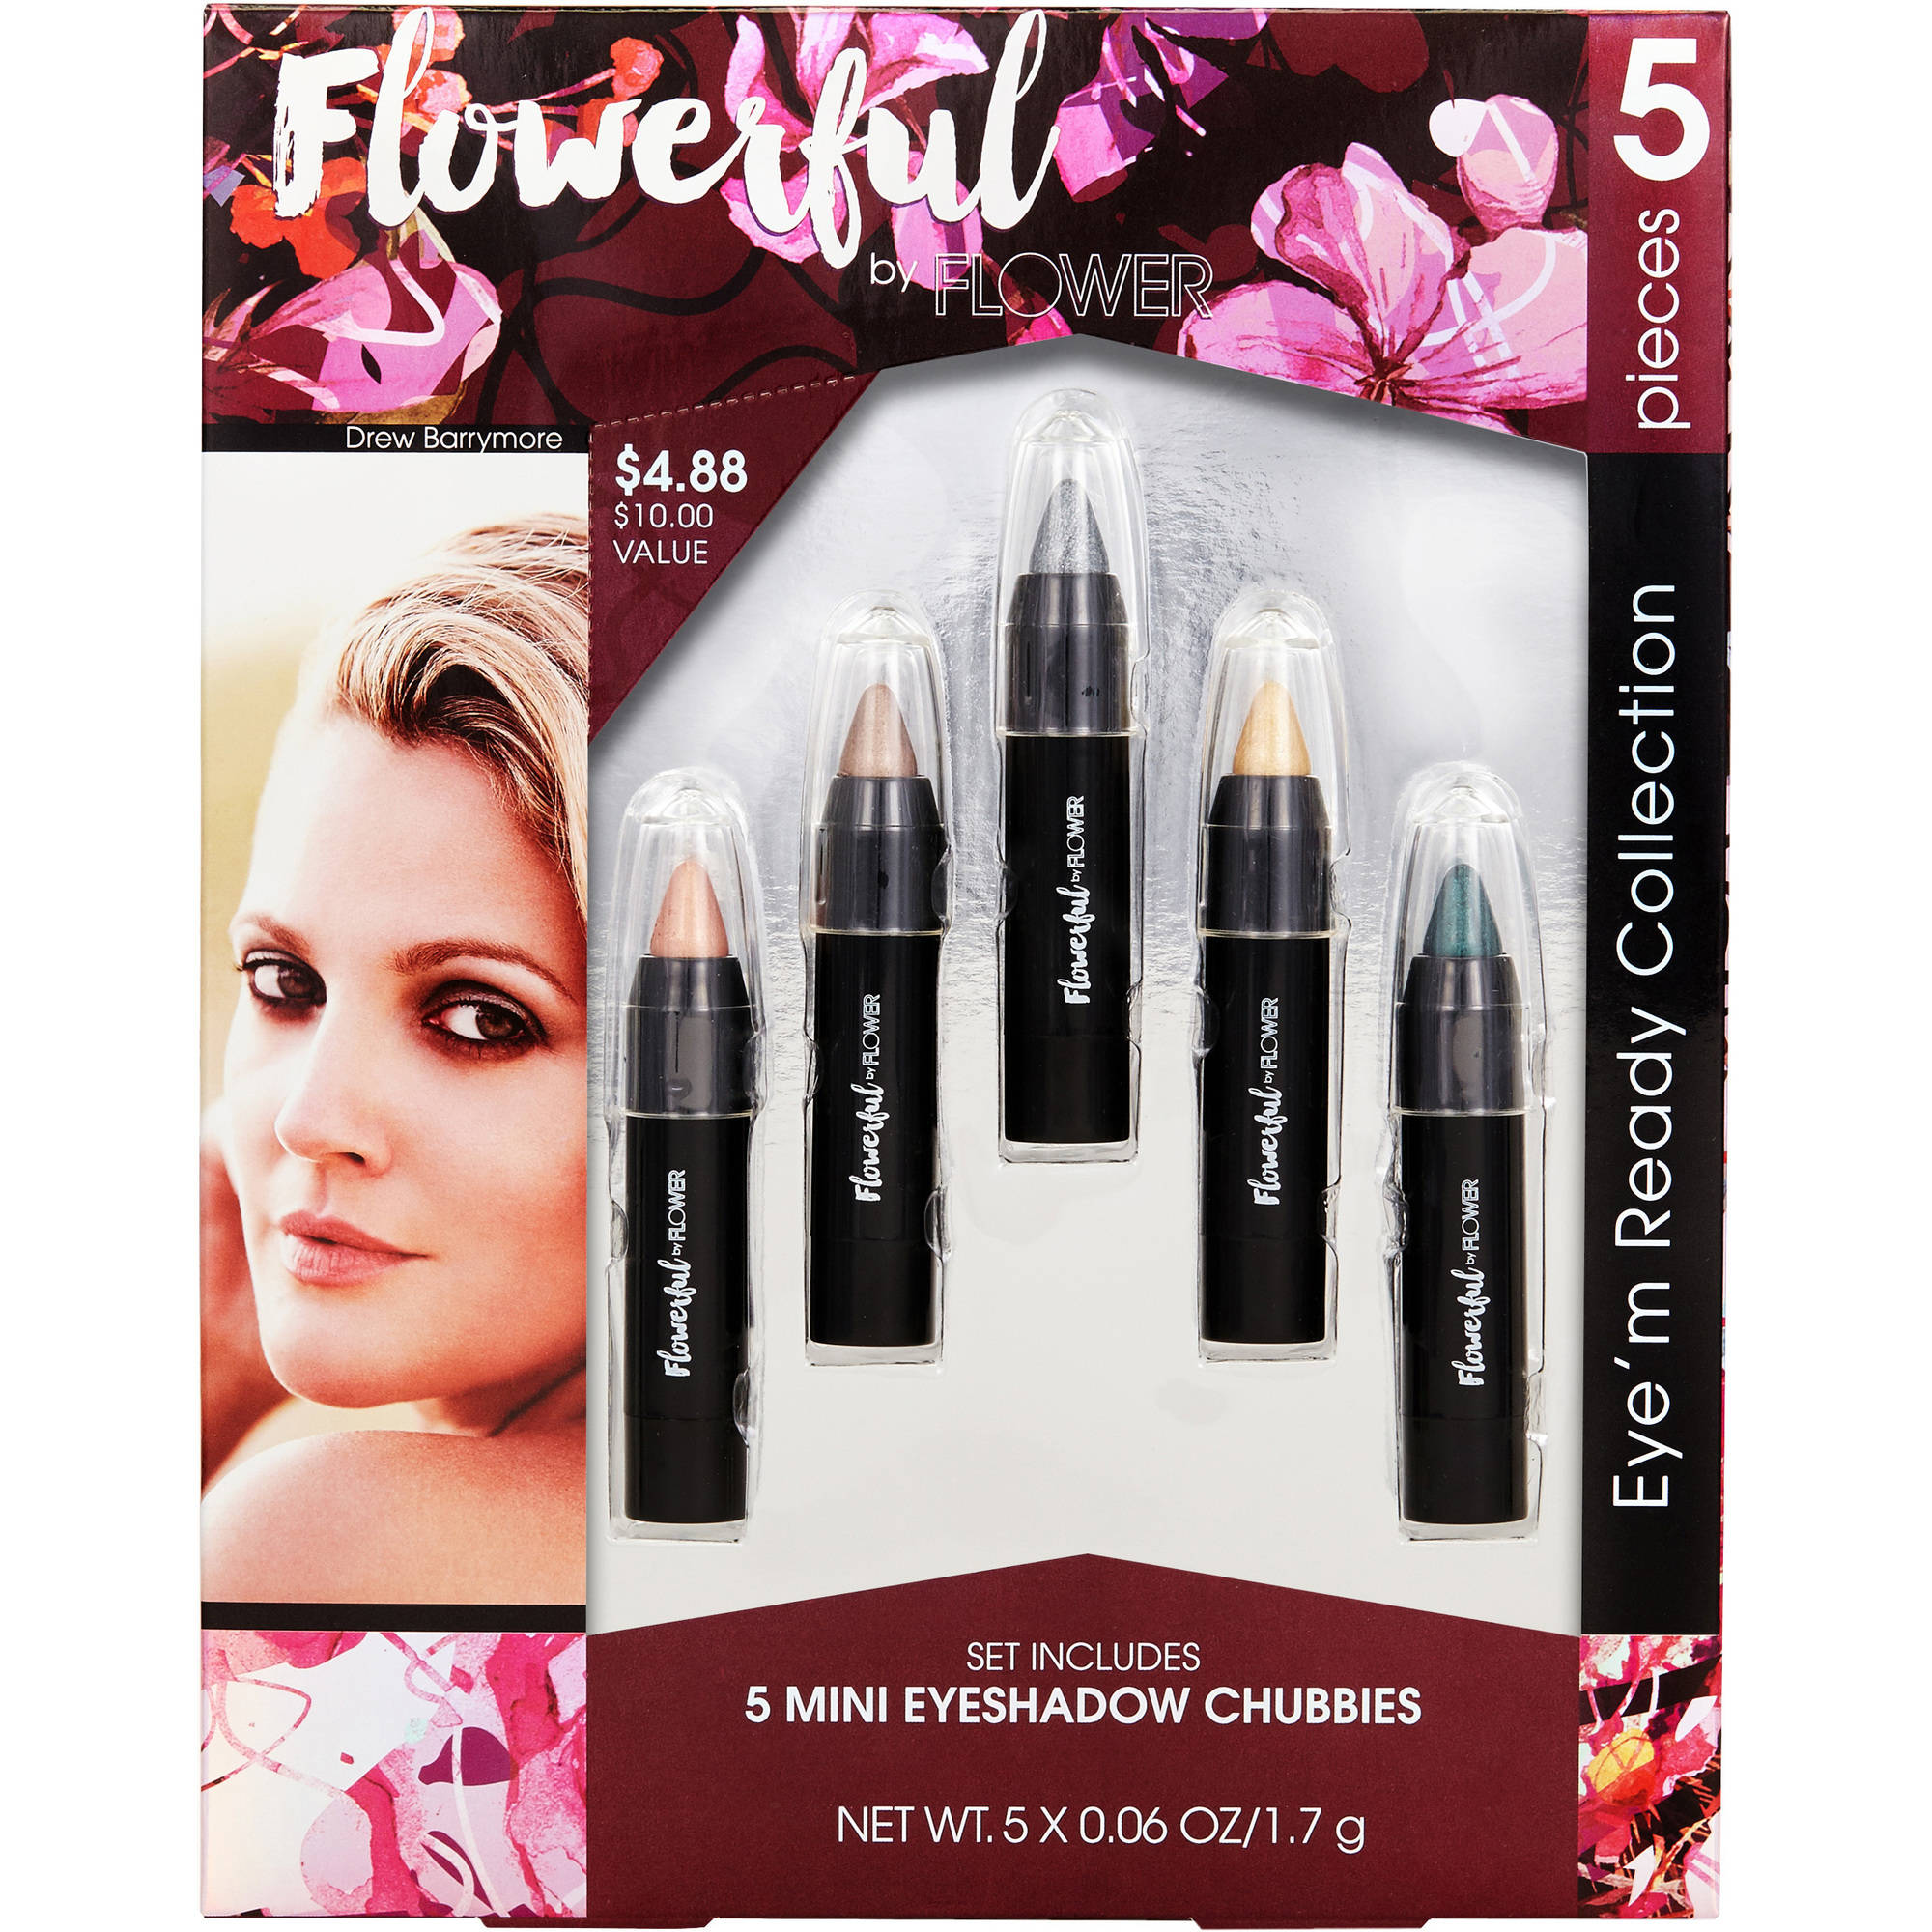 Flower Flowerful Eye'm Ready Collection Mini Eyeshadow Chubbies Gift Set, 5 pc